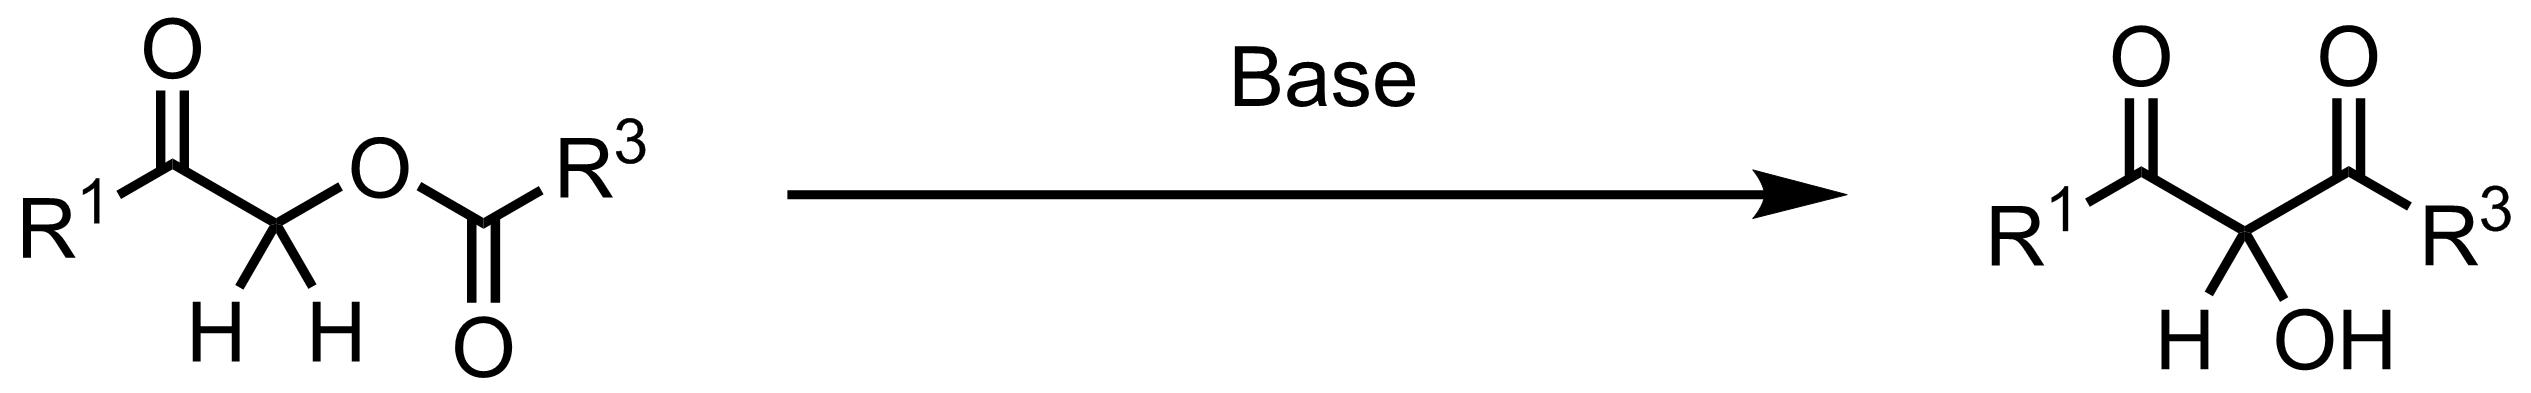 Schematic representation of the Chan Rearrangement.